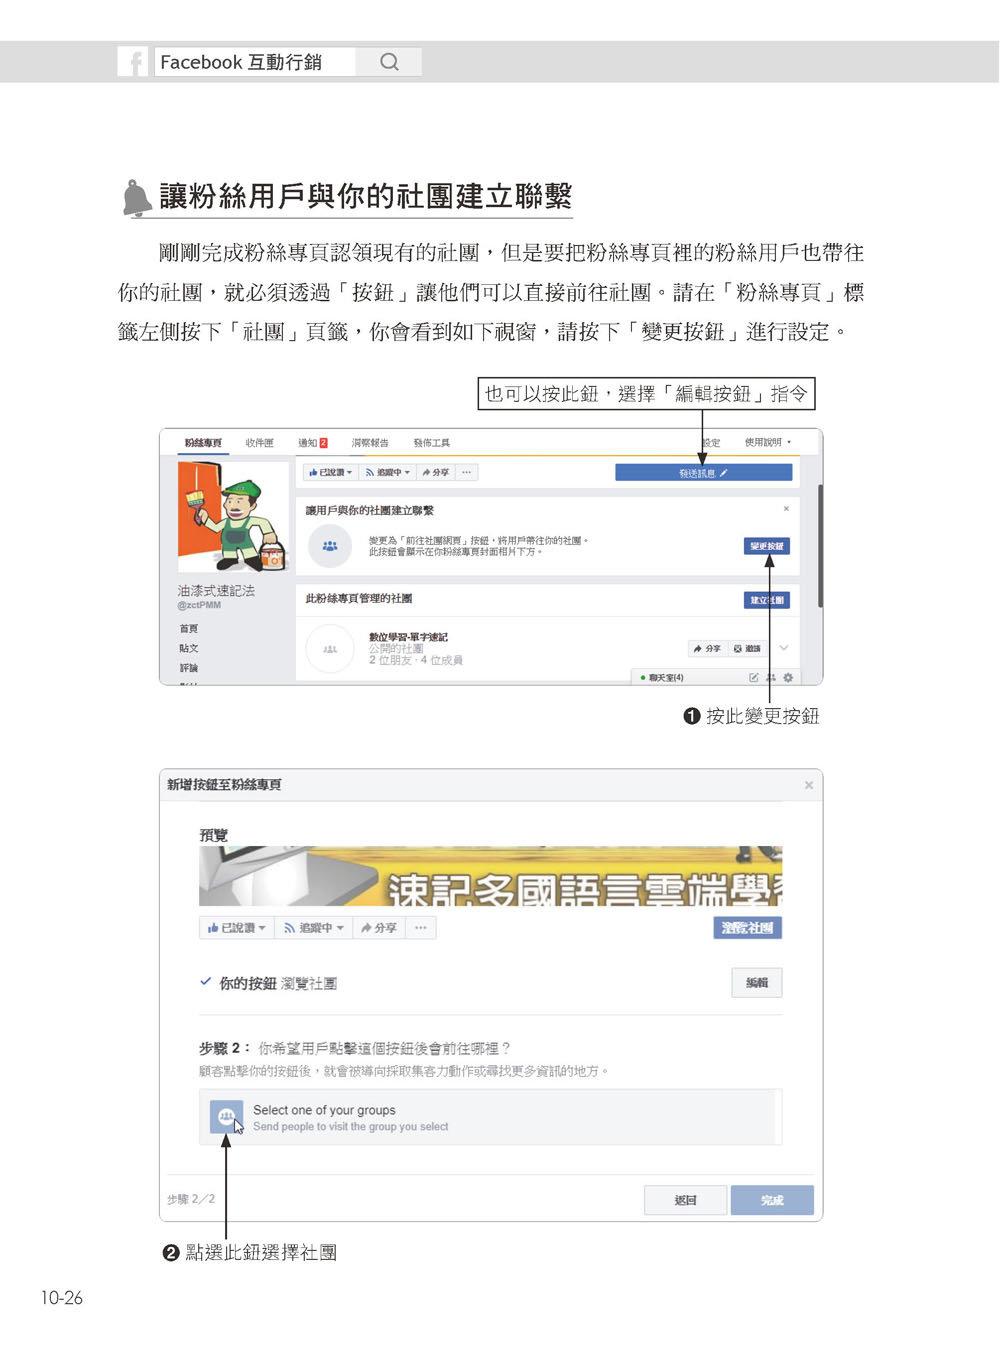 Facebook 互動行銷:社群口碑經營新思路+廣告投放如何有成效,想做好臉書行銷,操作心法就在這!-preview-61